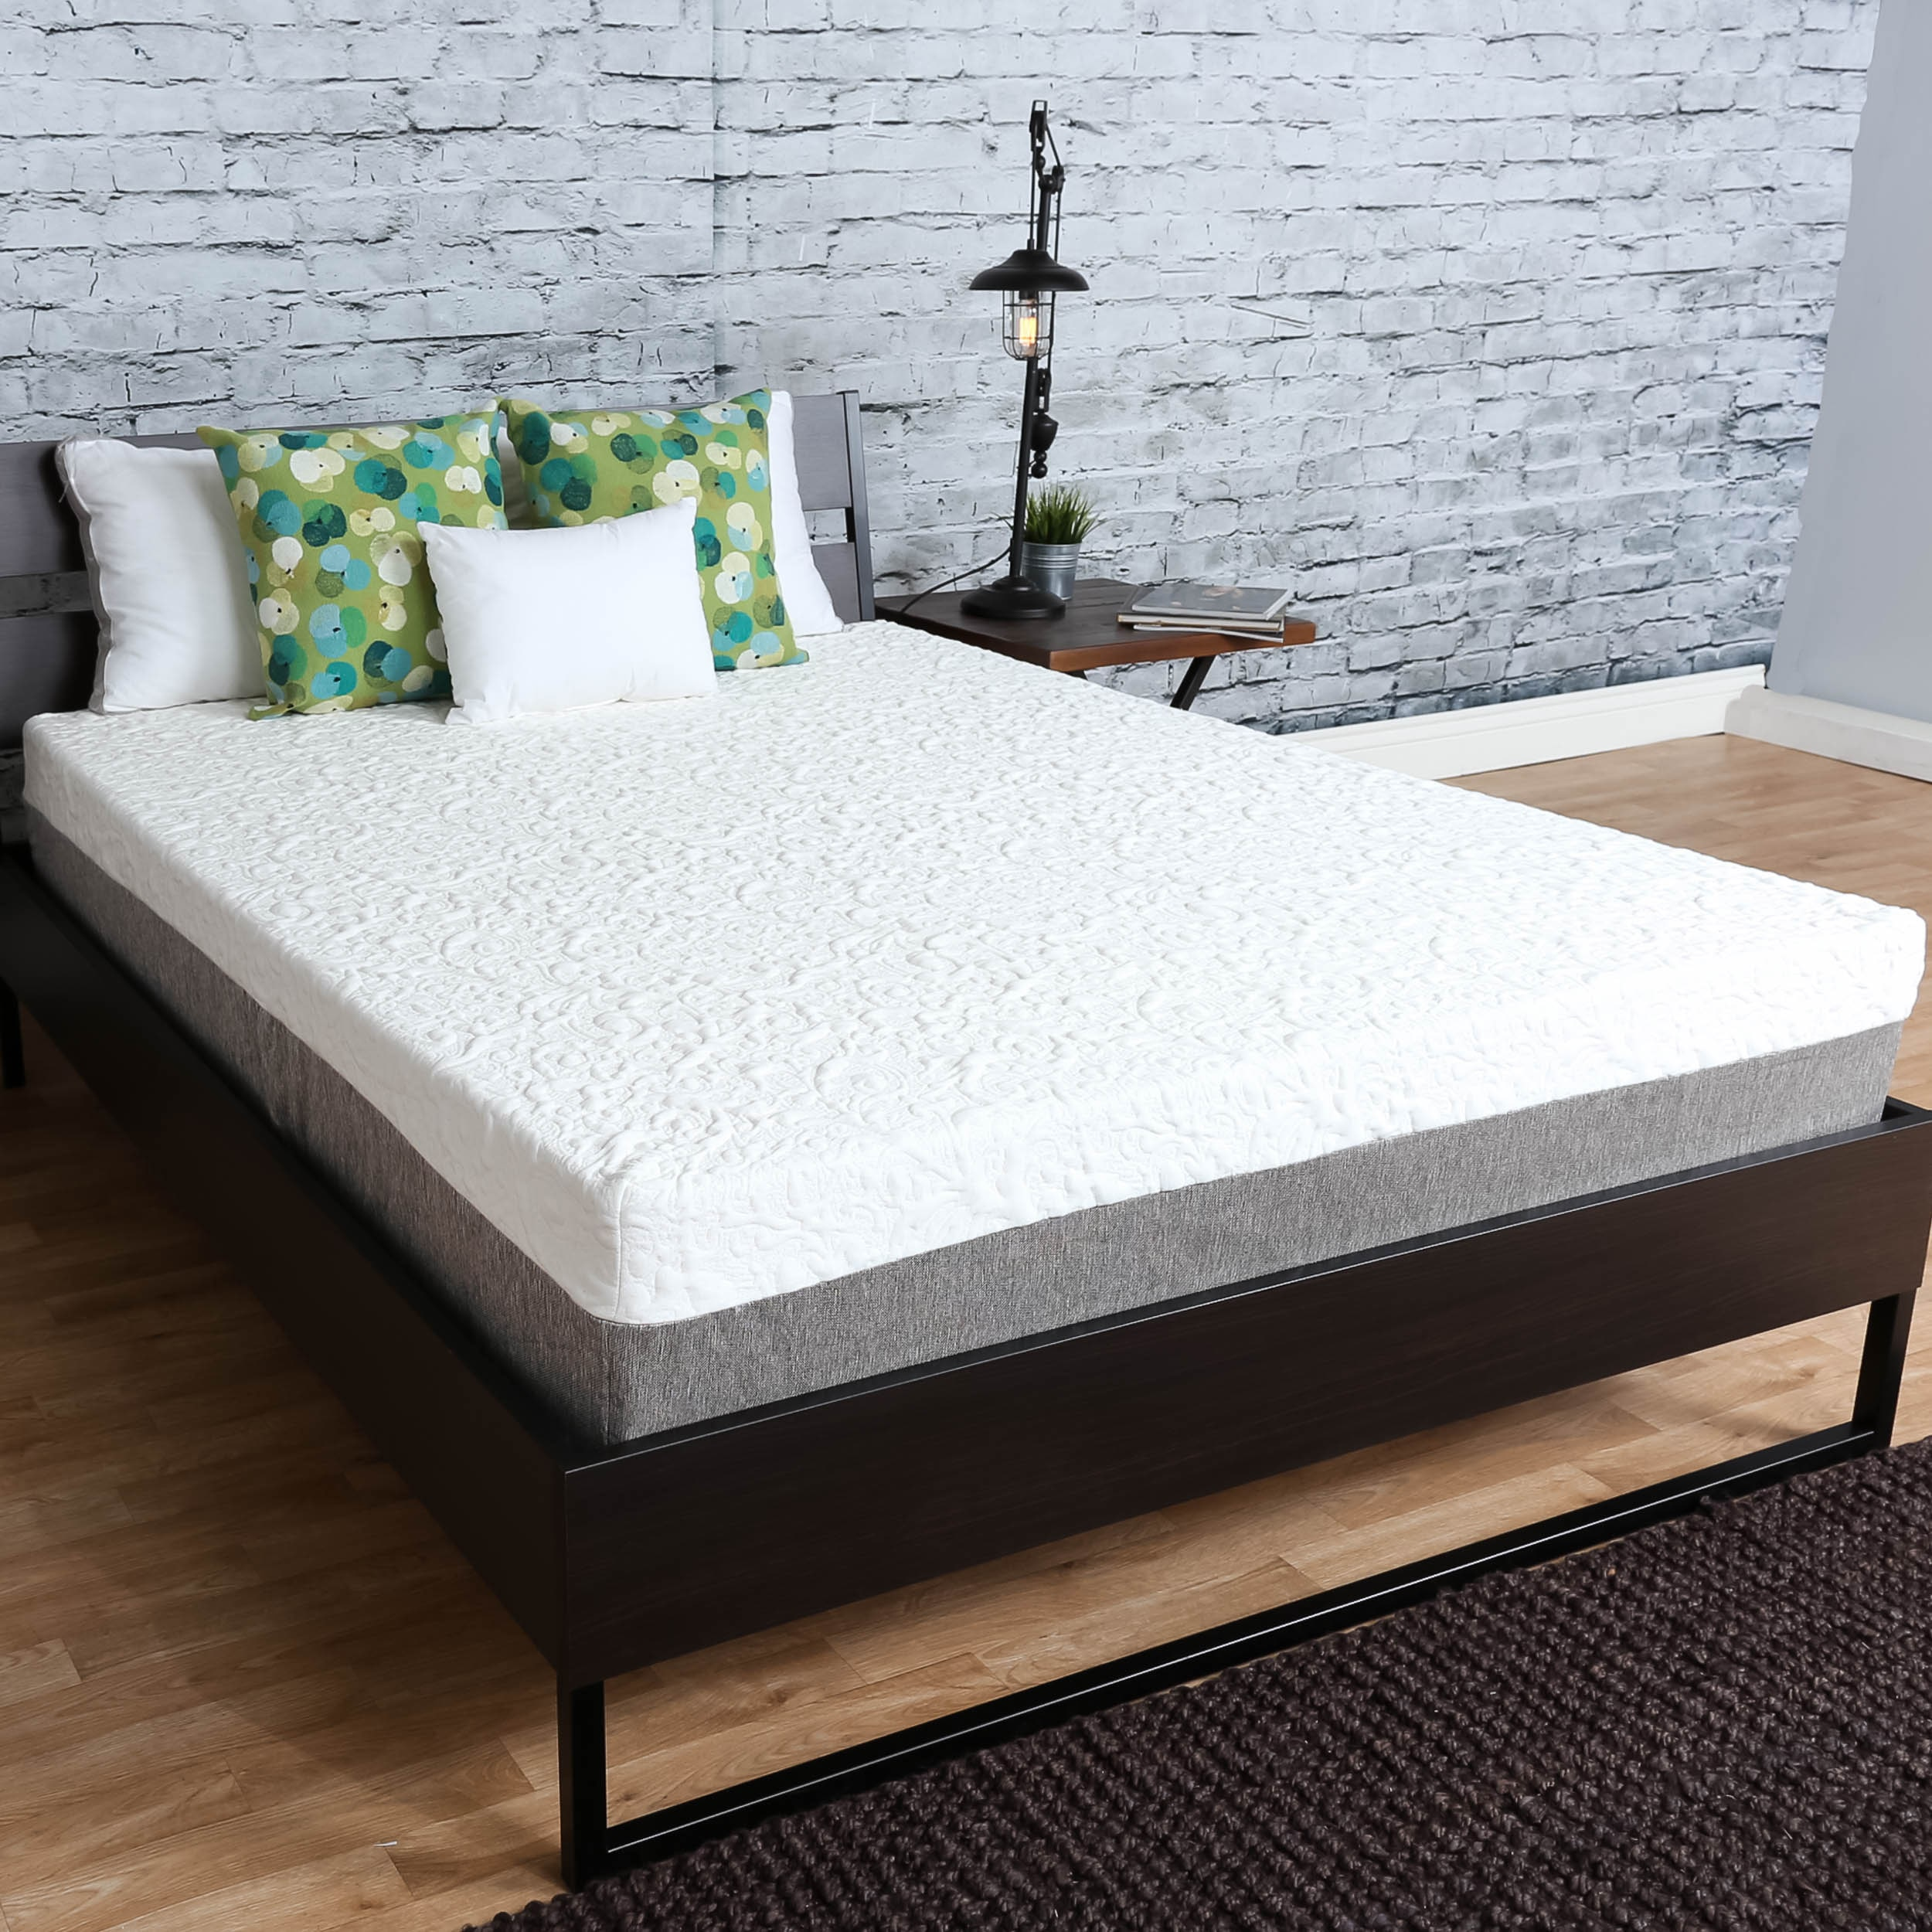 Somette  Medium Firm 10 inch twin XL size Graphite Gel Memory Foam Mattress